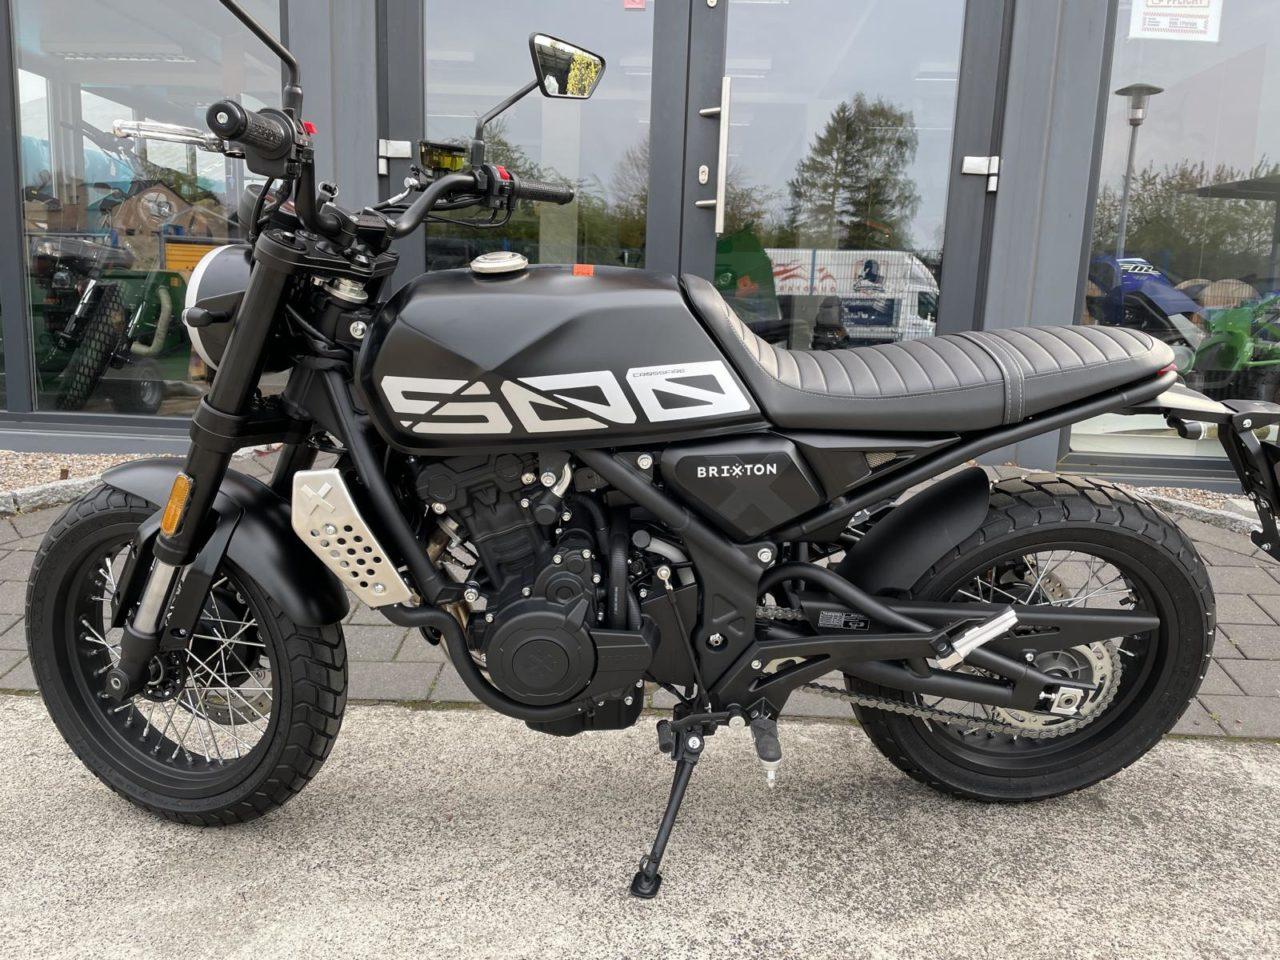 Motorrad Brixton Crossfire 500 X, Modell 2021, ABS u. Euro 5